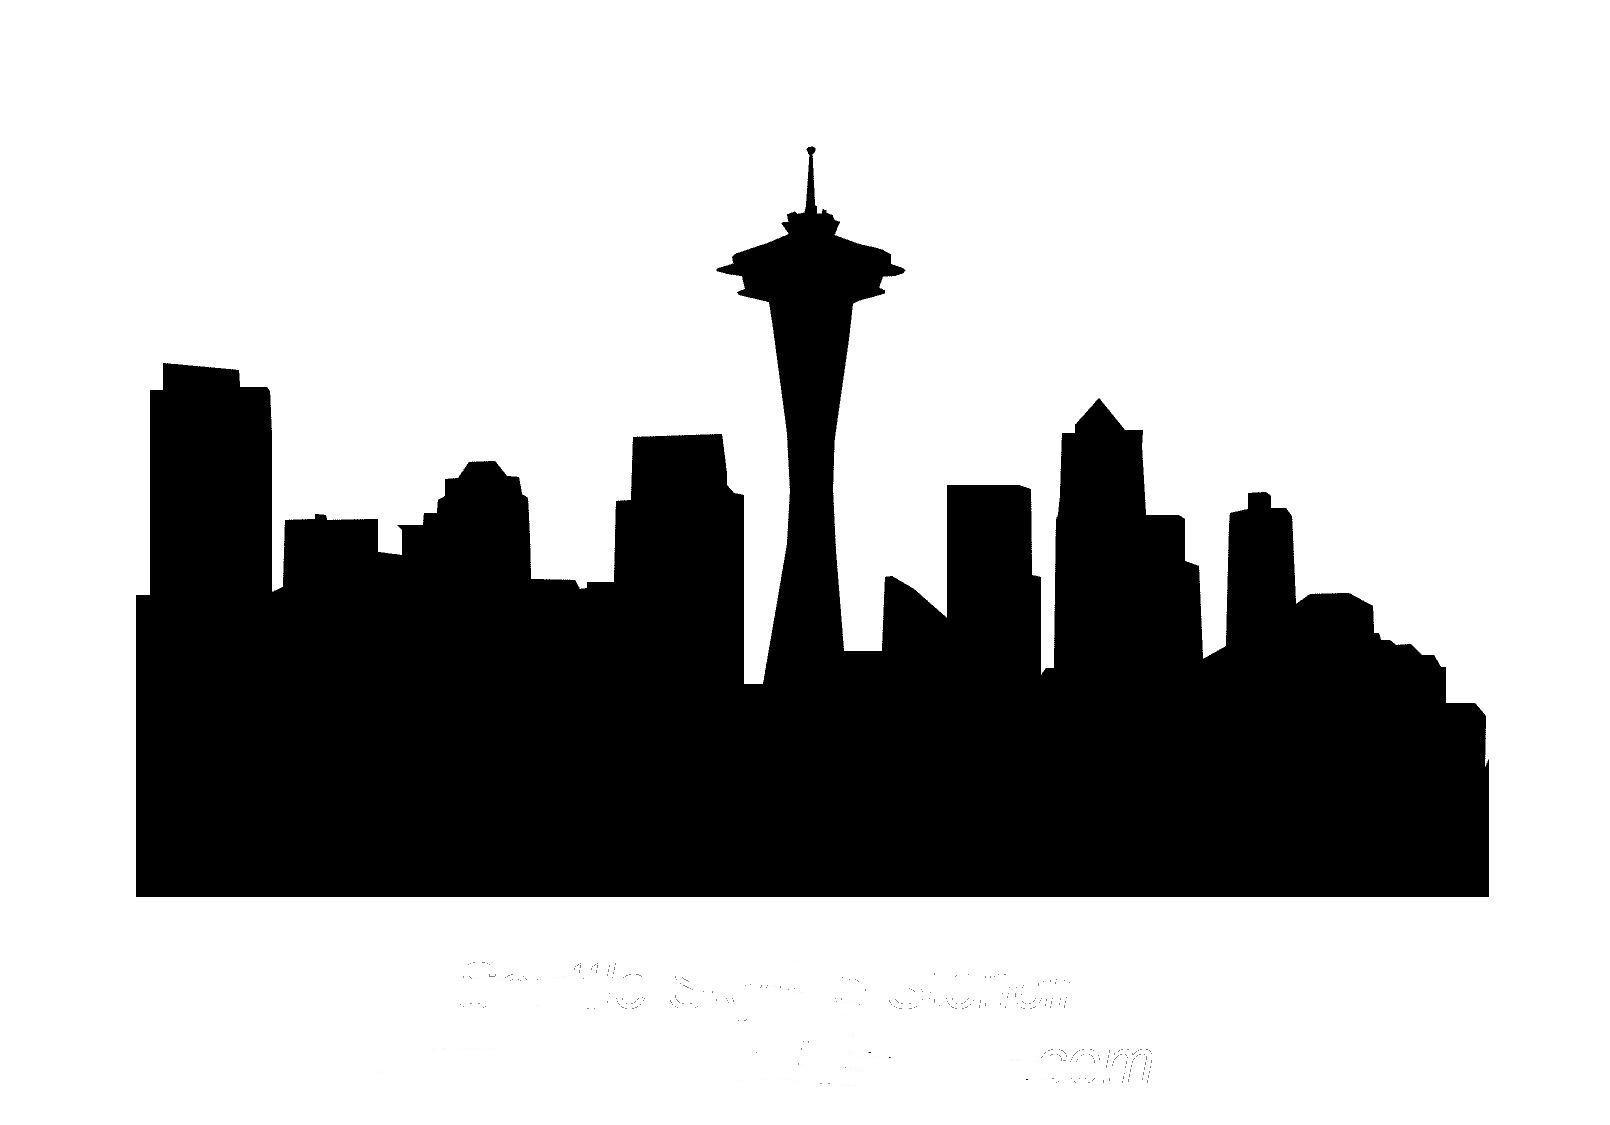 city skyline outline simple - photo #18